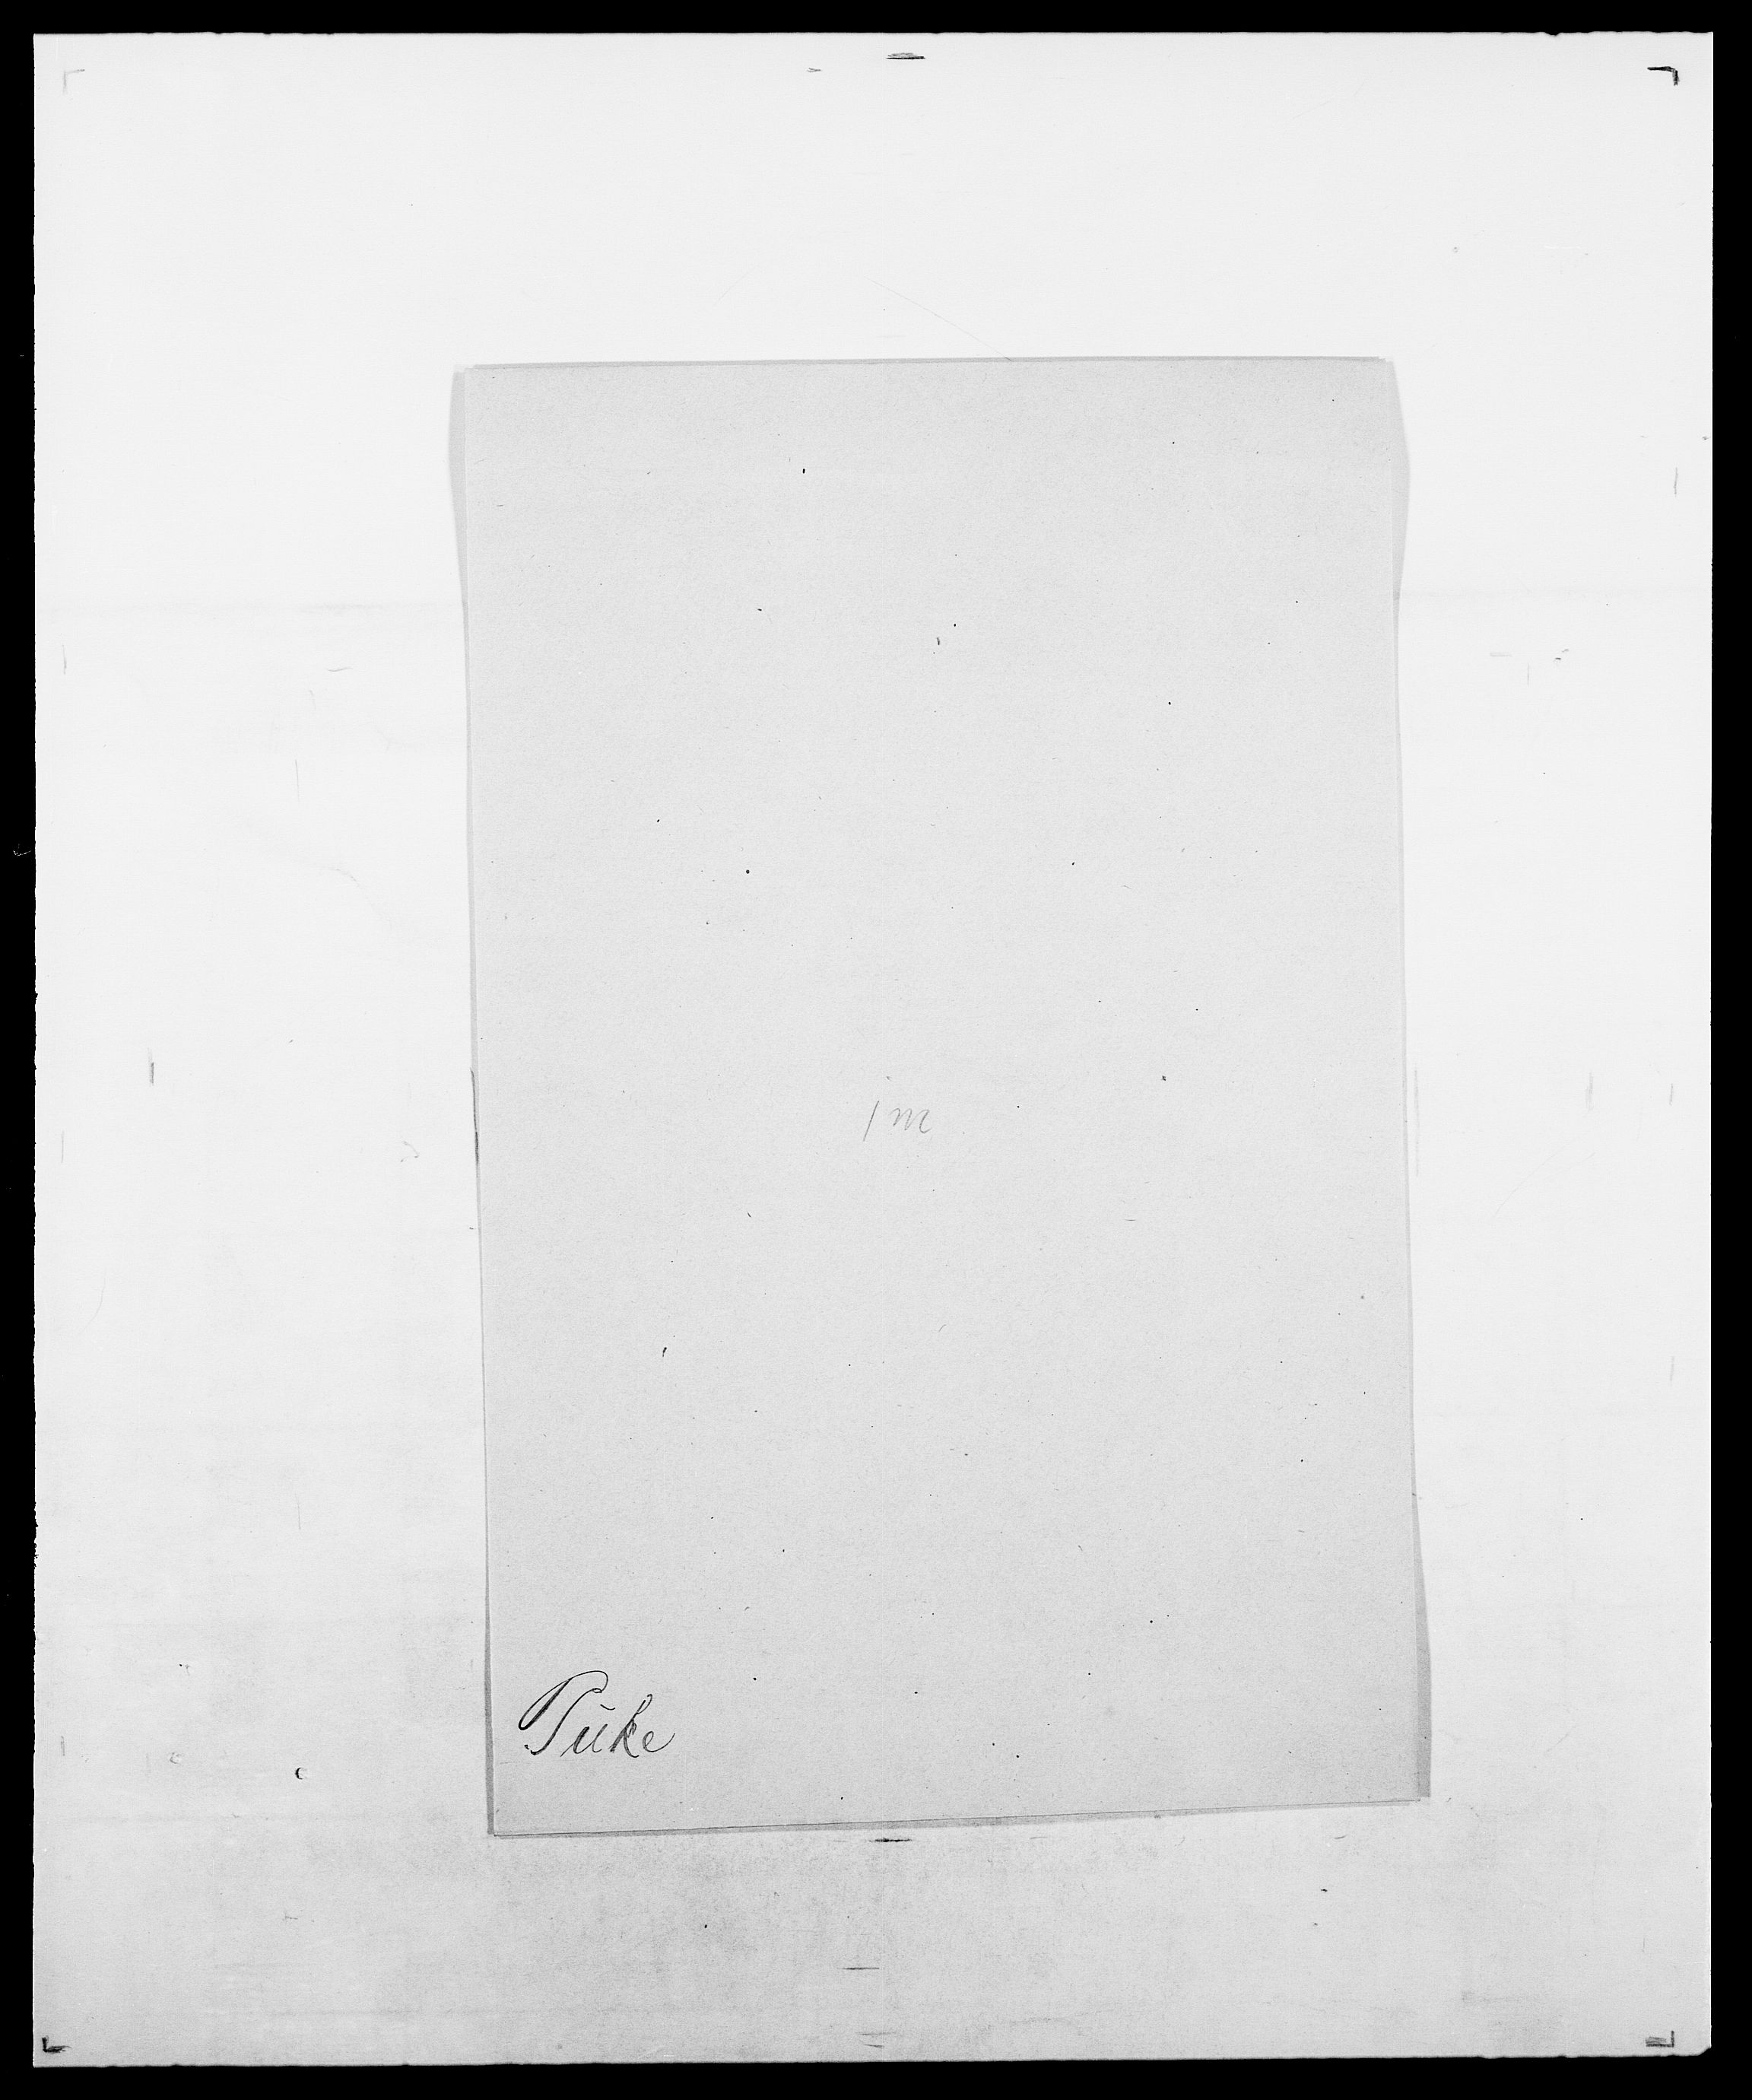 SAO, Delgobe, Charles Antoine - samling, D/Da/L0031: de Place - Raaum, s. 437